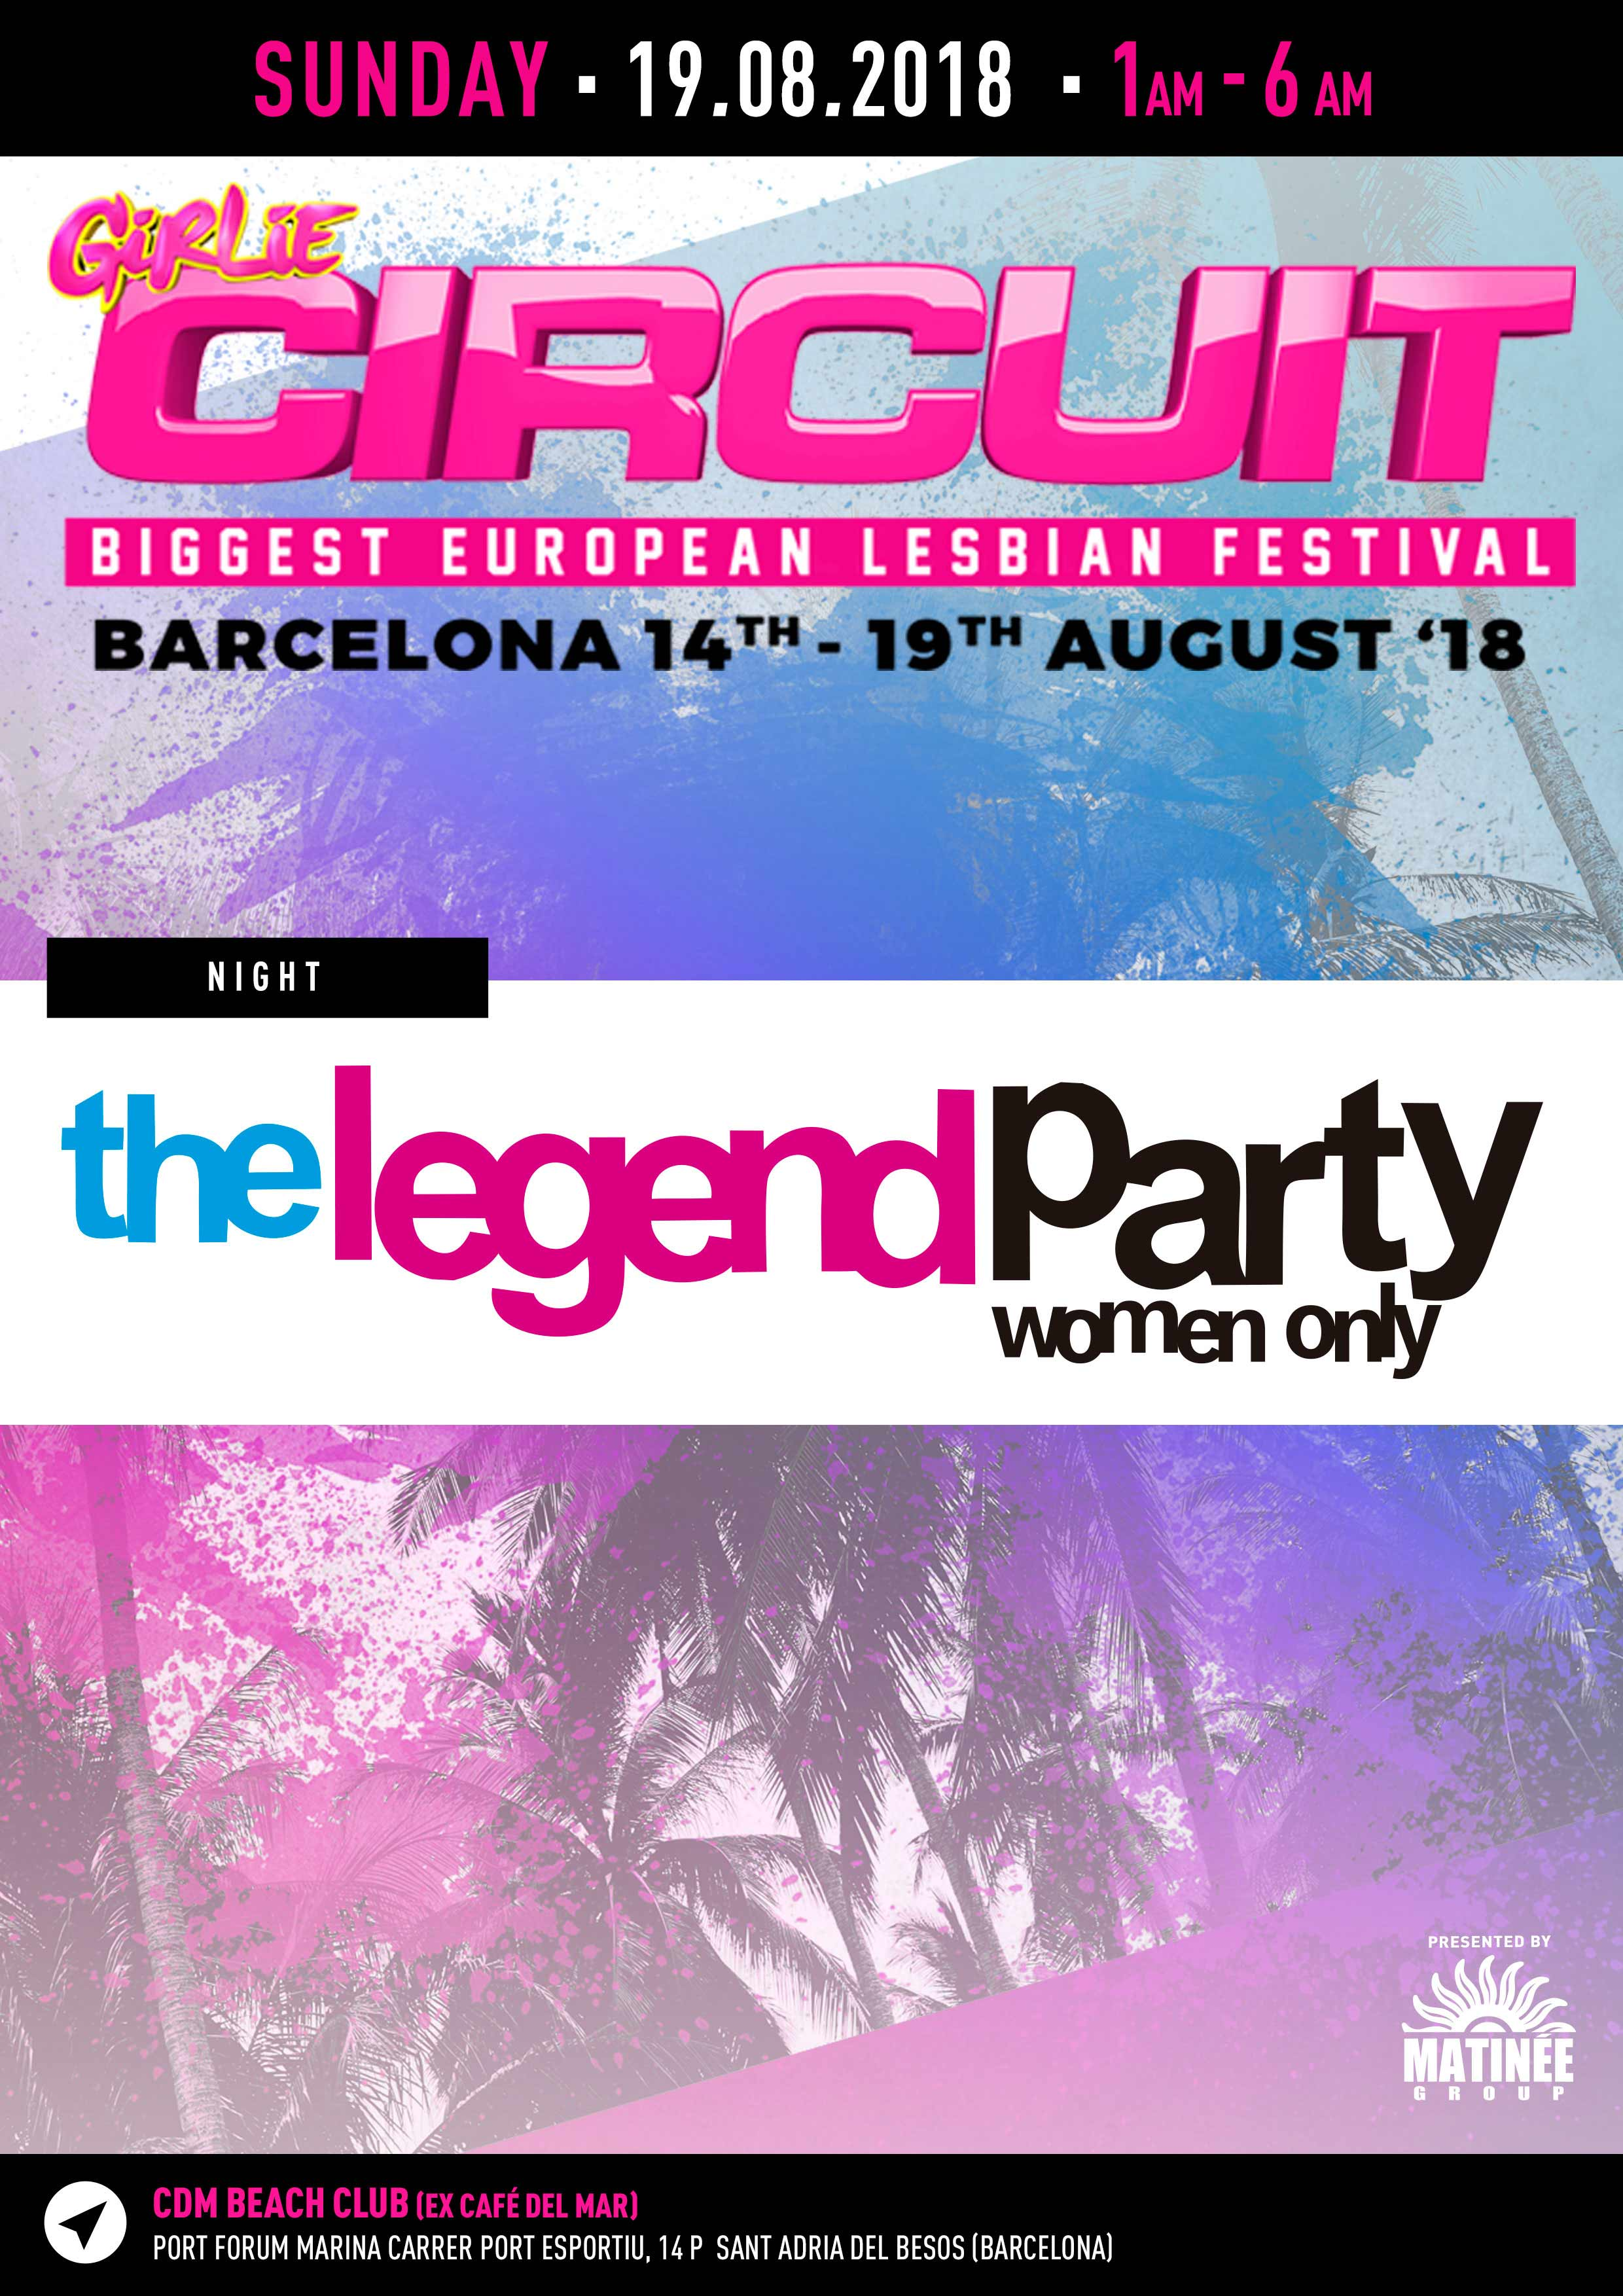 GIRLIE_CIRCUIT_FLYER-barcelona-circuit